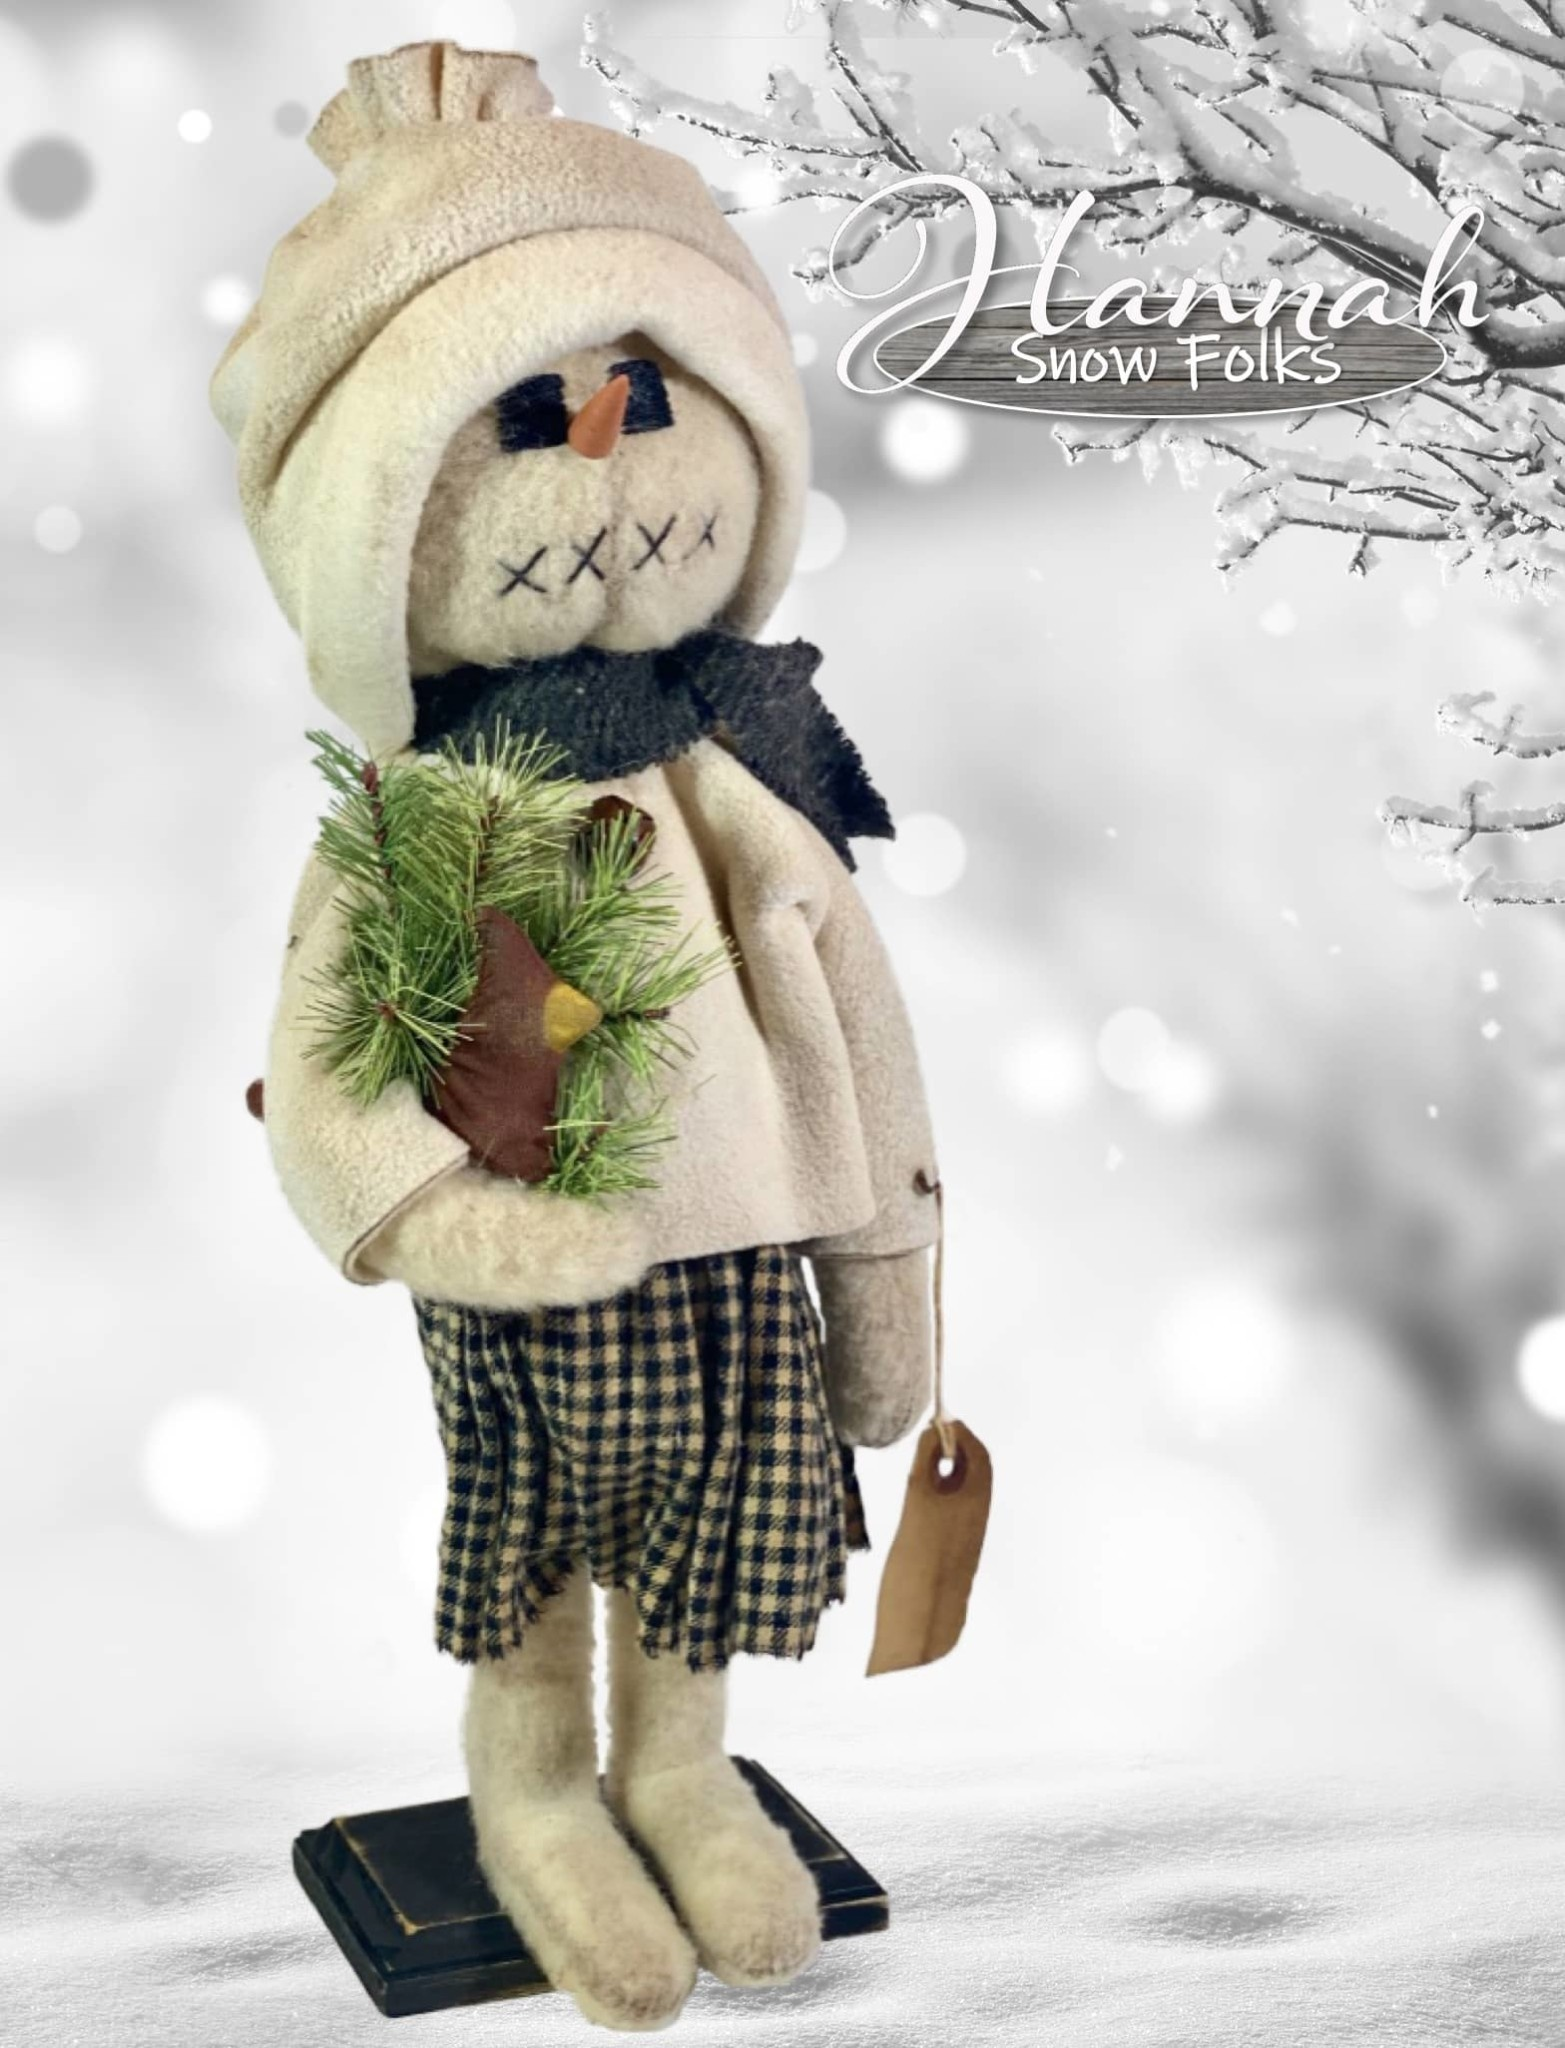 Nana's Farmhouse Hannah The Snow Girl Wearing Black Plaid Dress Holding Cardinal & Greens